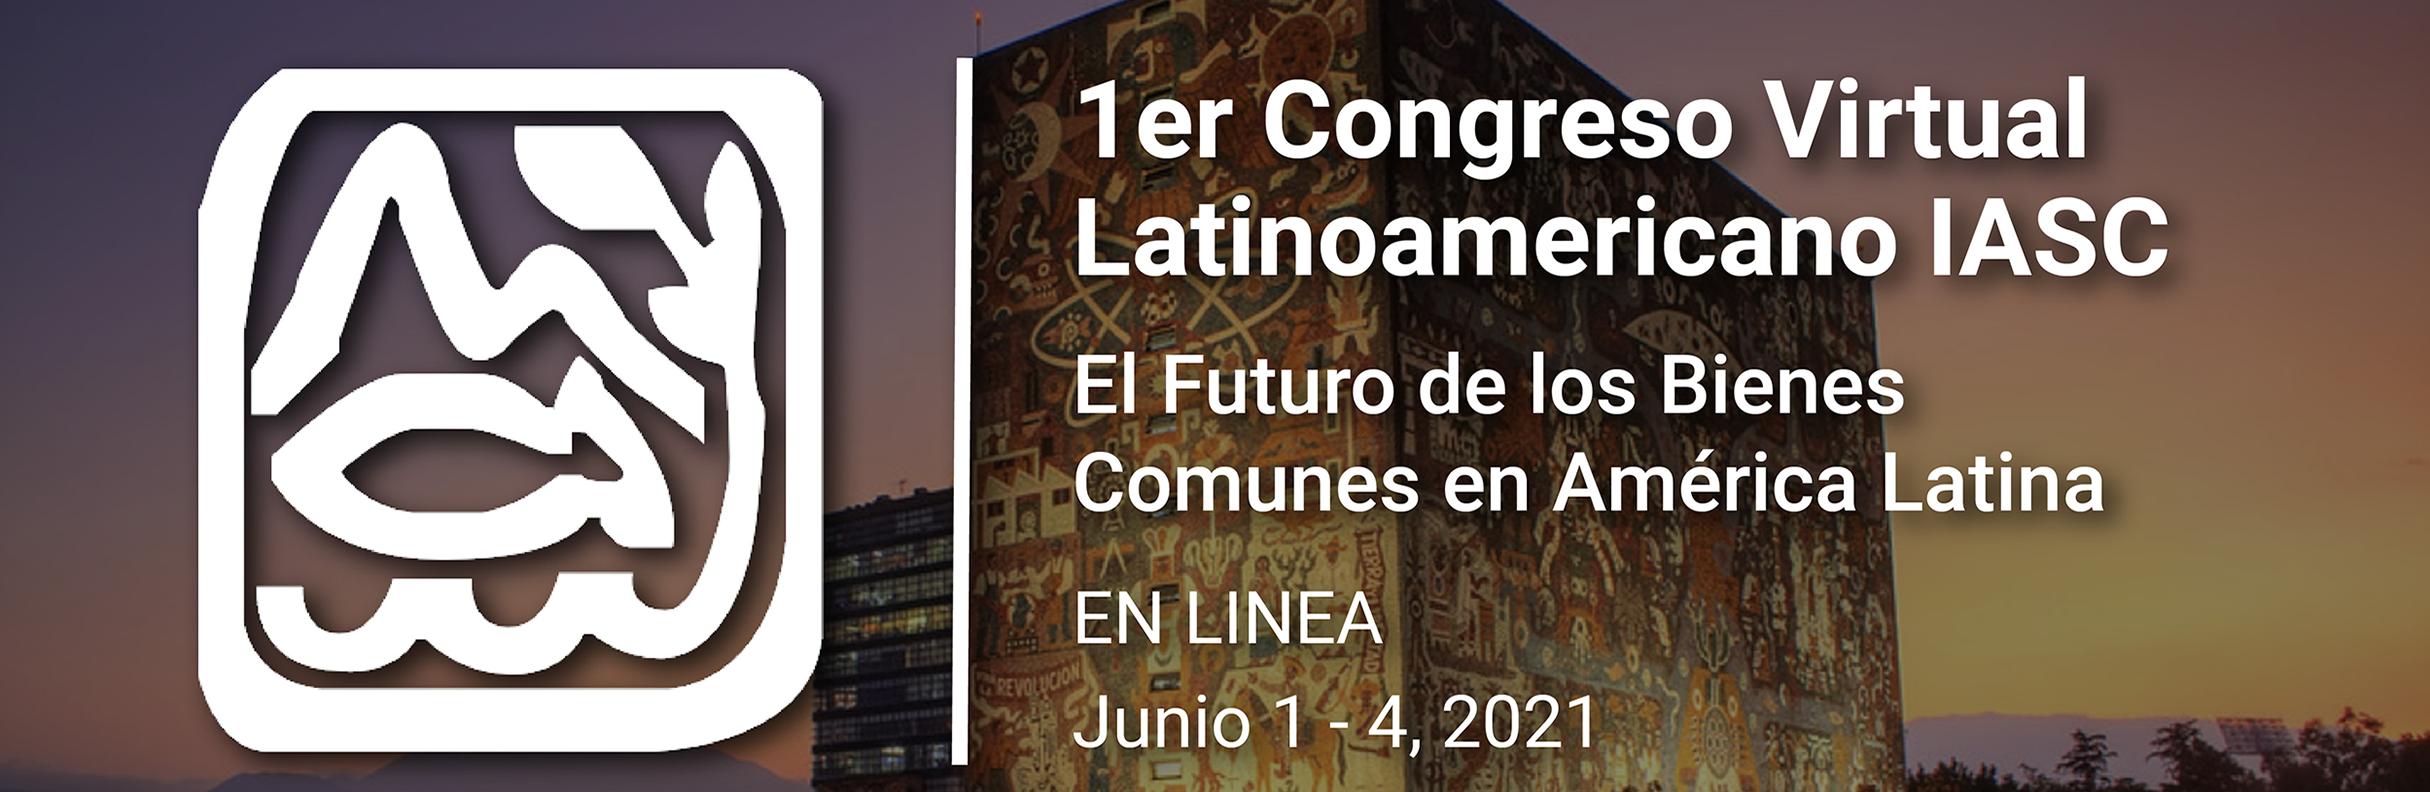 1er Congreso Latinoamericano IASC